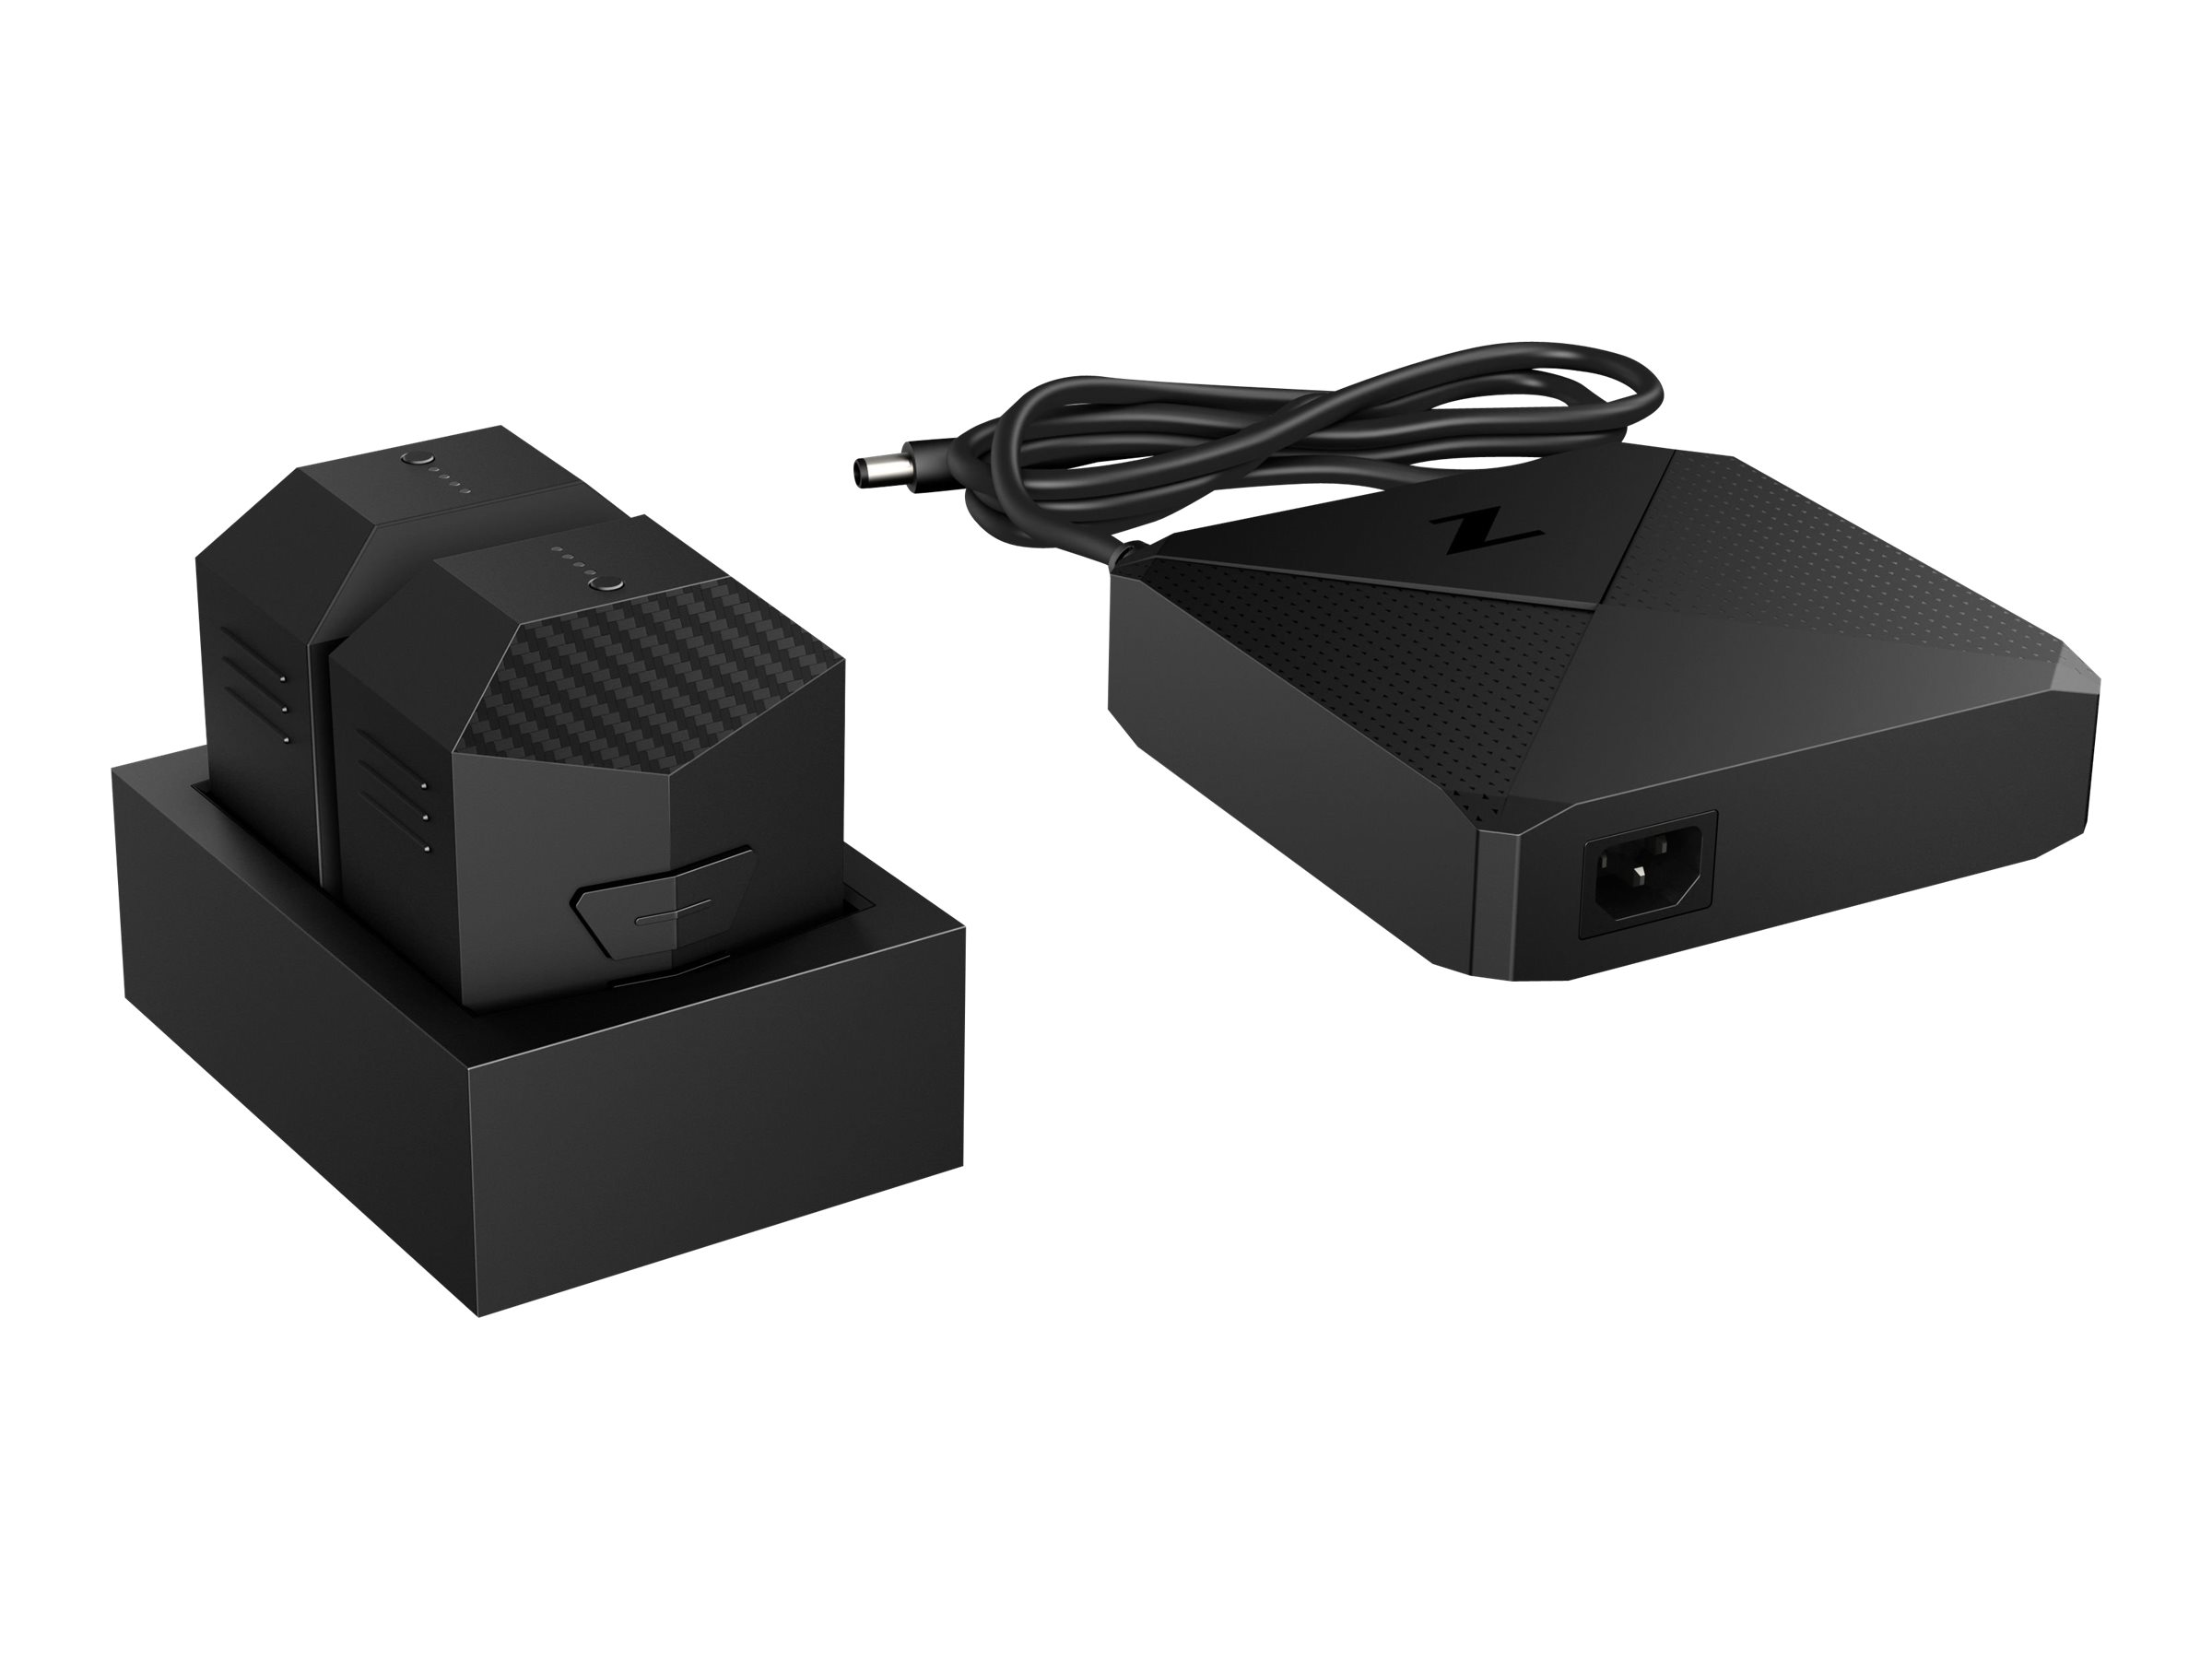 Hp z vr backpack battery charger batterieladegeraet dc 19 5 v europa fuer workstation z vr backpack g1 8211890 2hy51aa abb